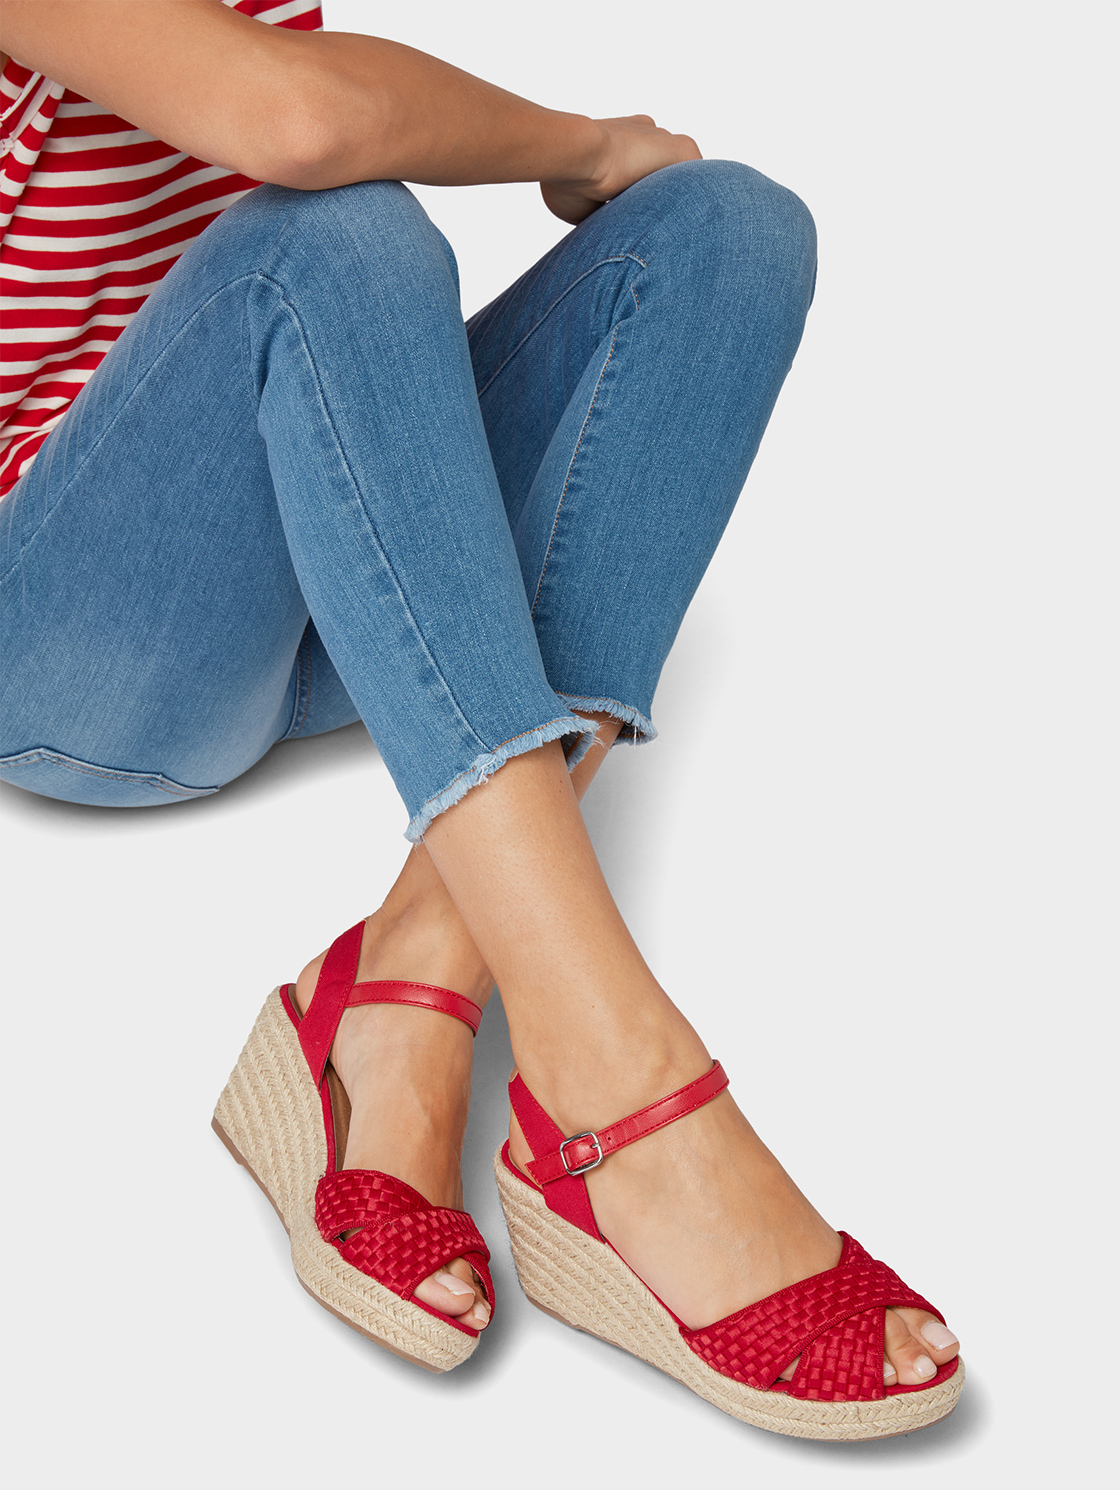 Обувь 69901020070540 фото